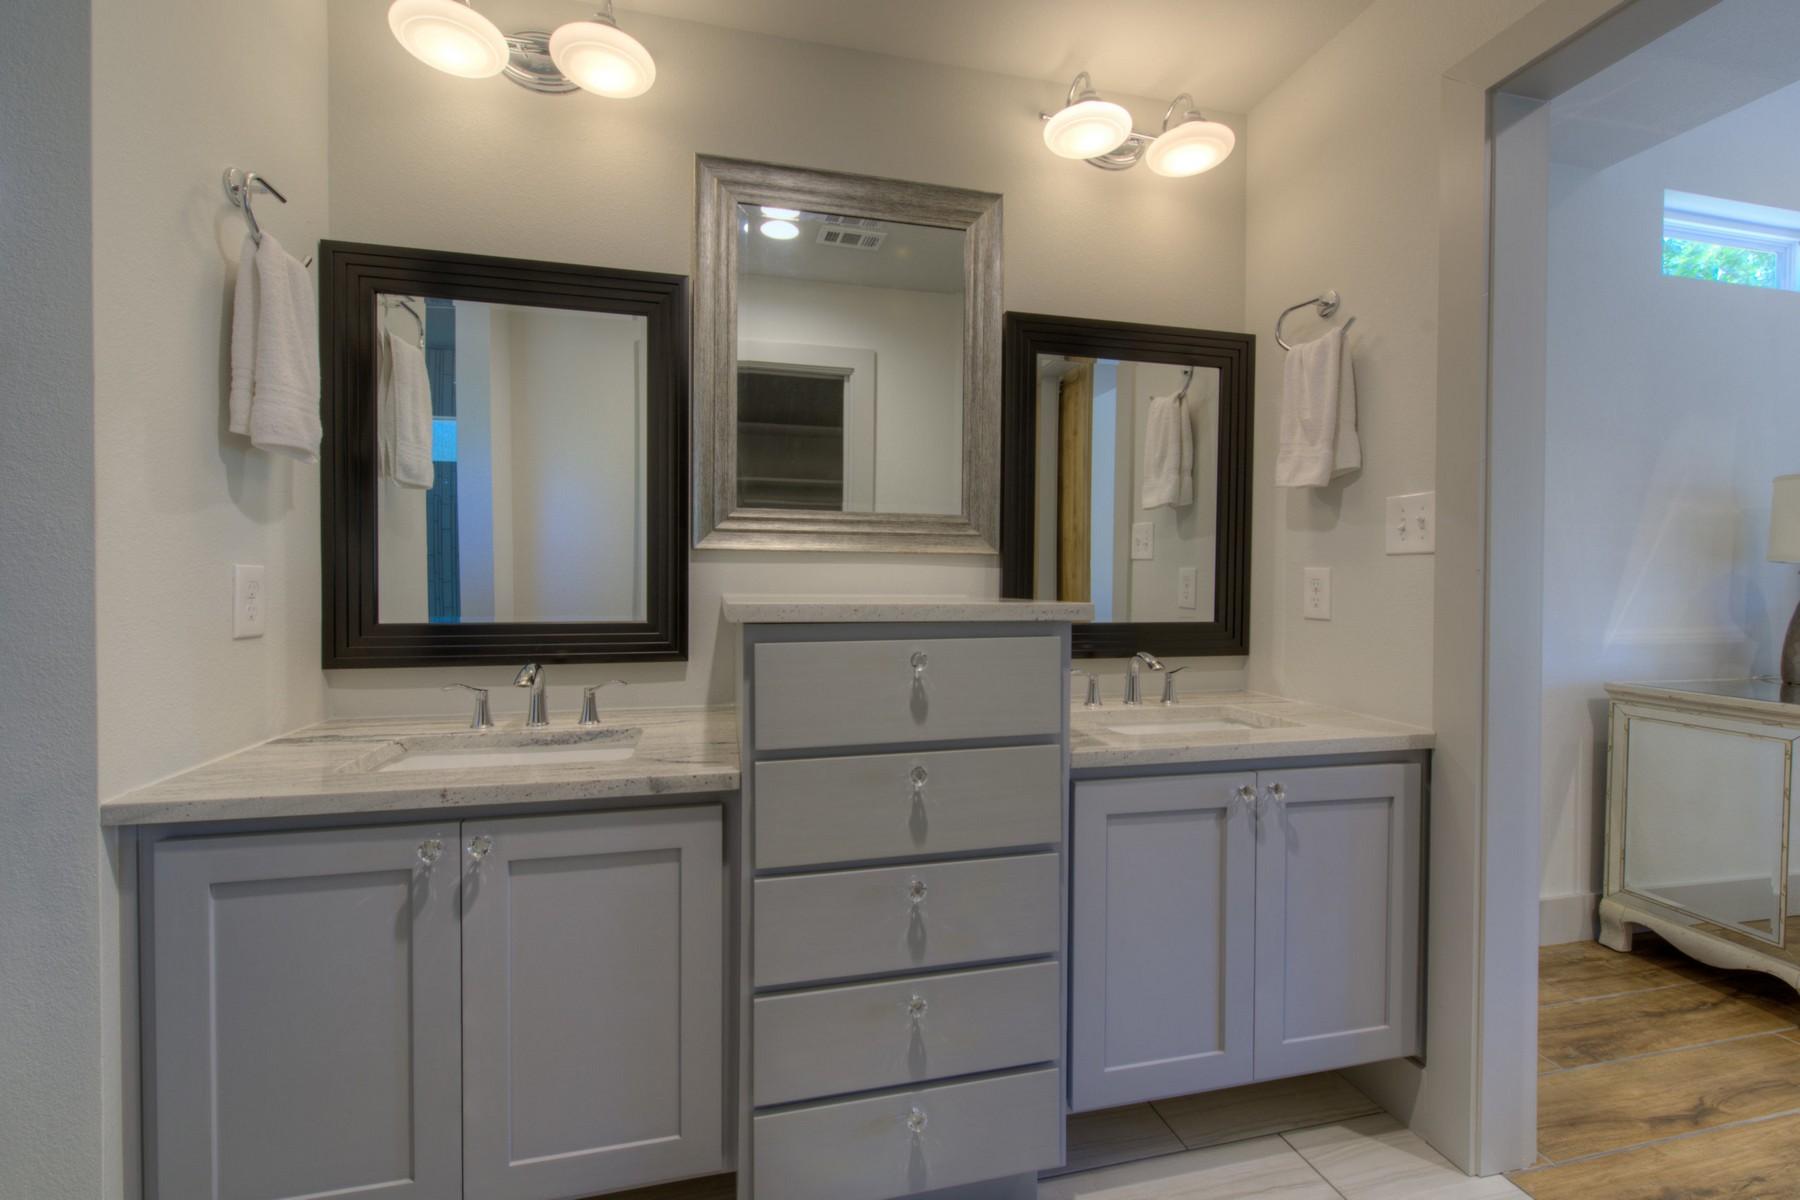 Additional photo for property listing at Near Bustling Burnet Rd 2500 Addison Ave Austin, Texas 78757 Estados Unidos